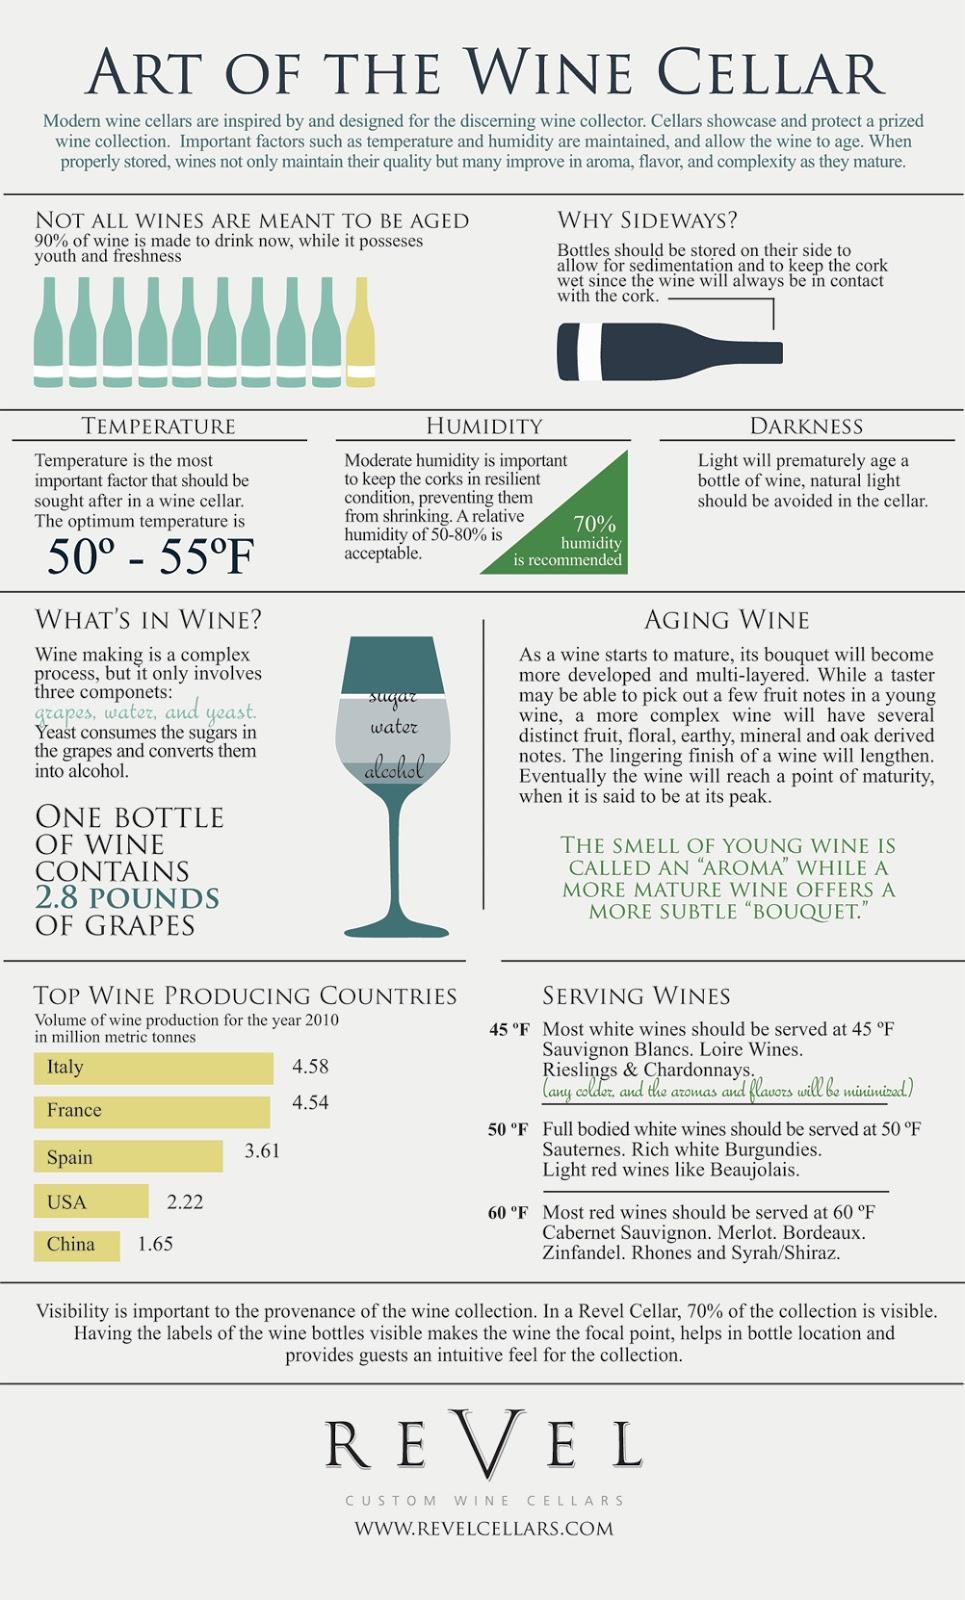 Wine Cellar Infographic